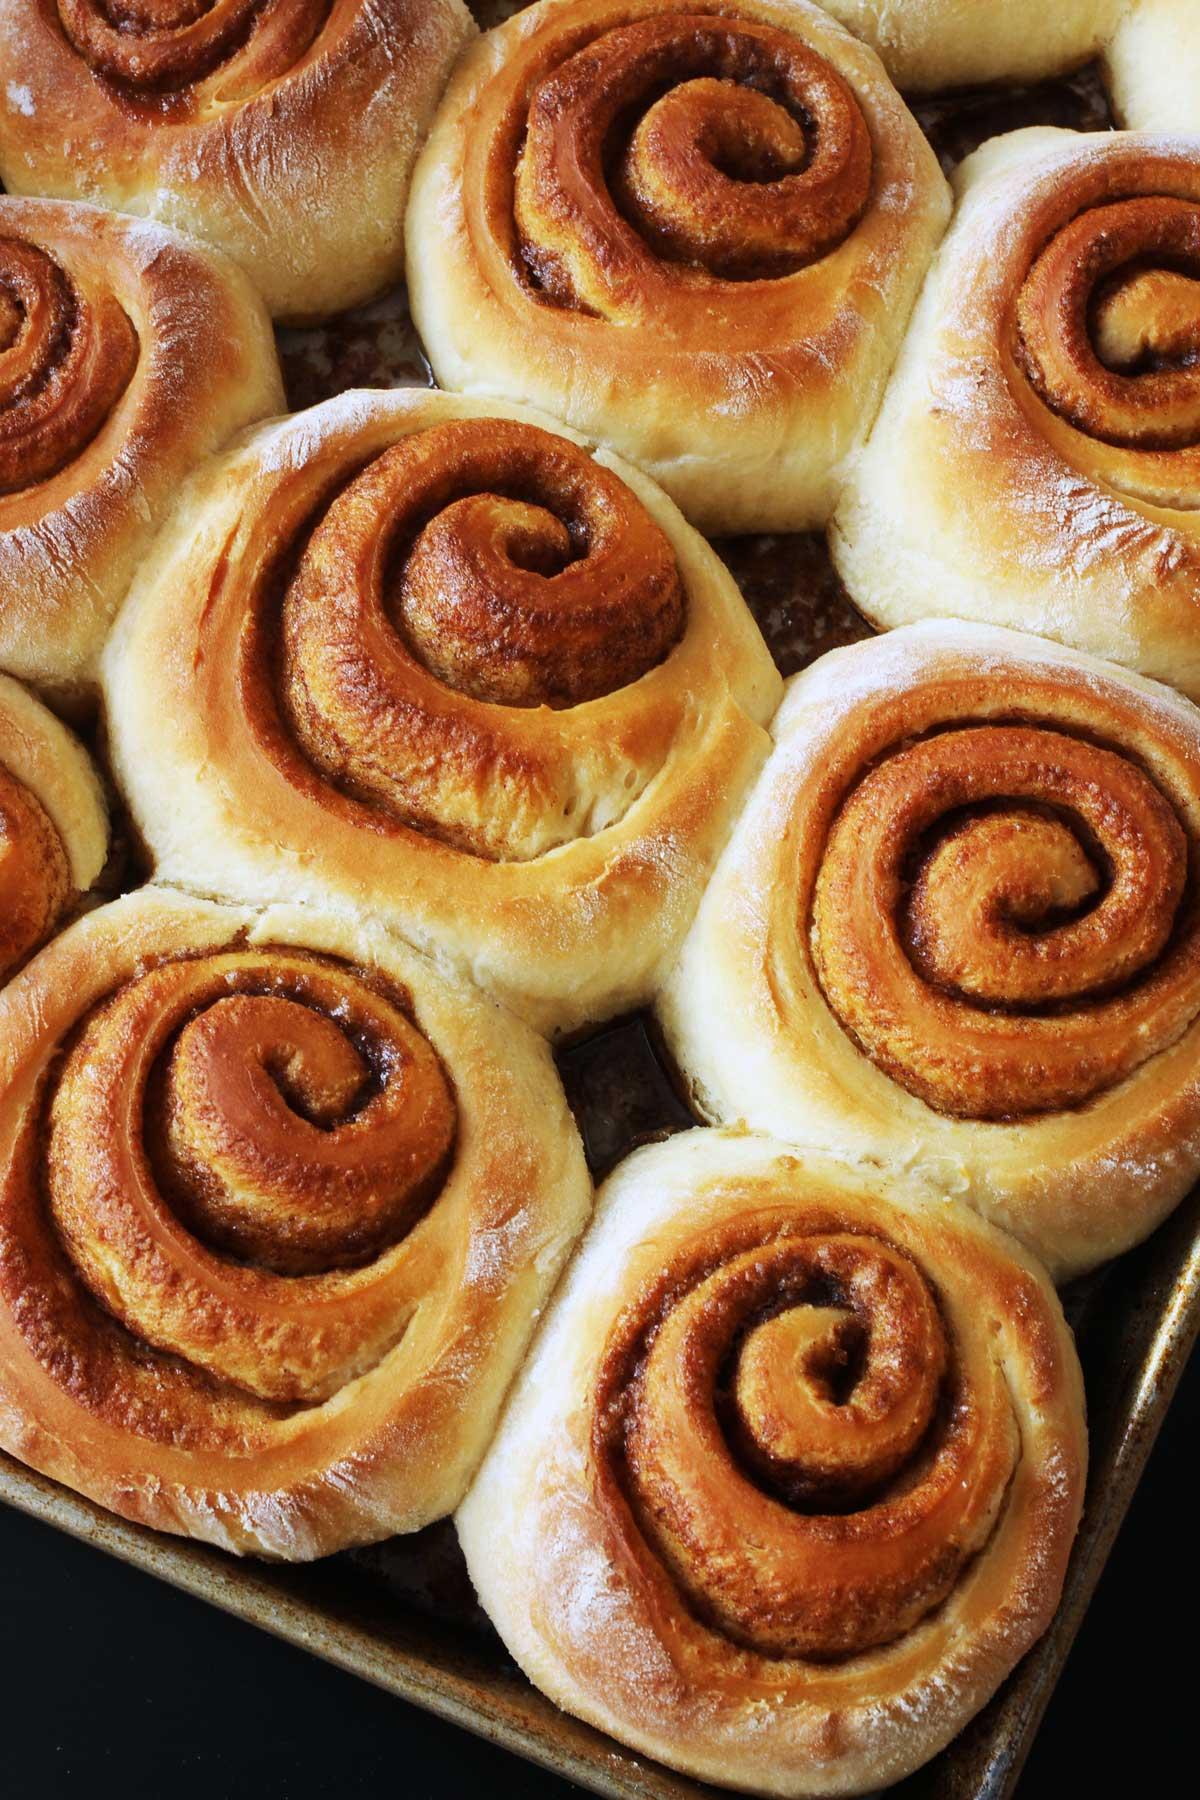 tray of baked orange cinnamon rolls